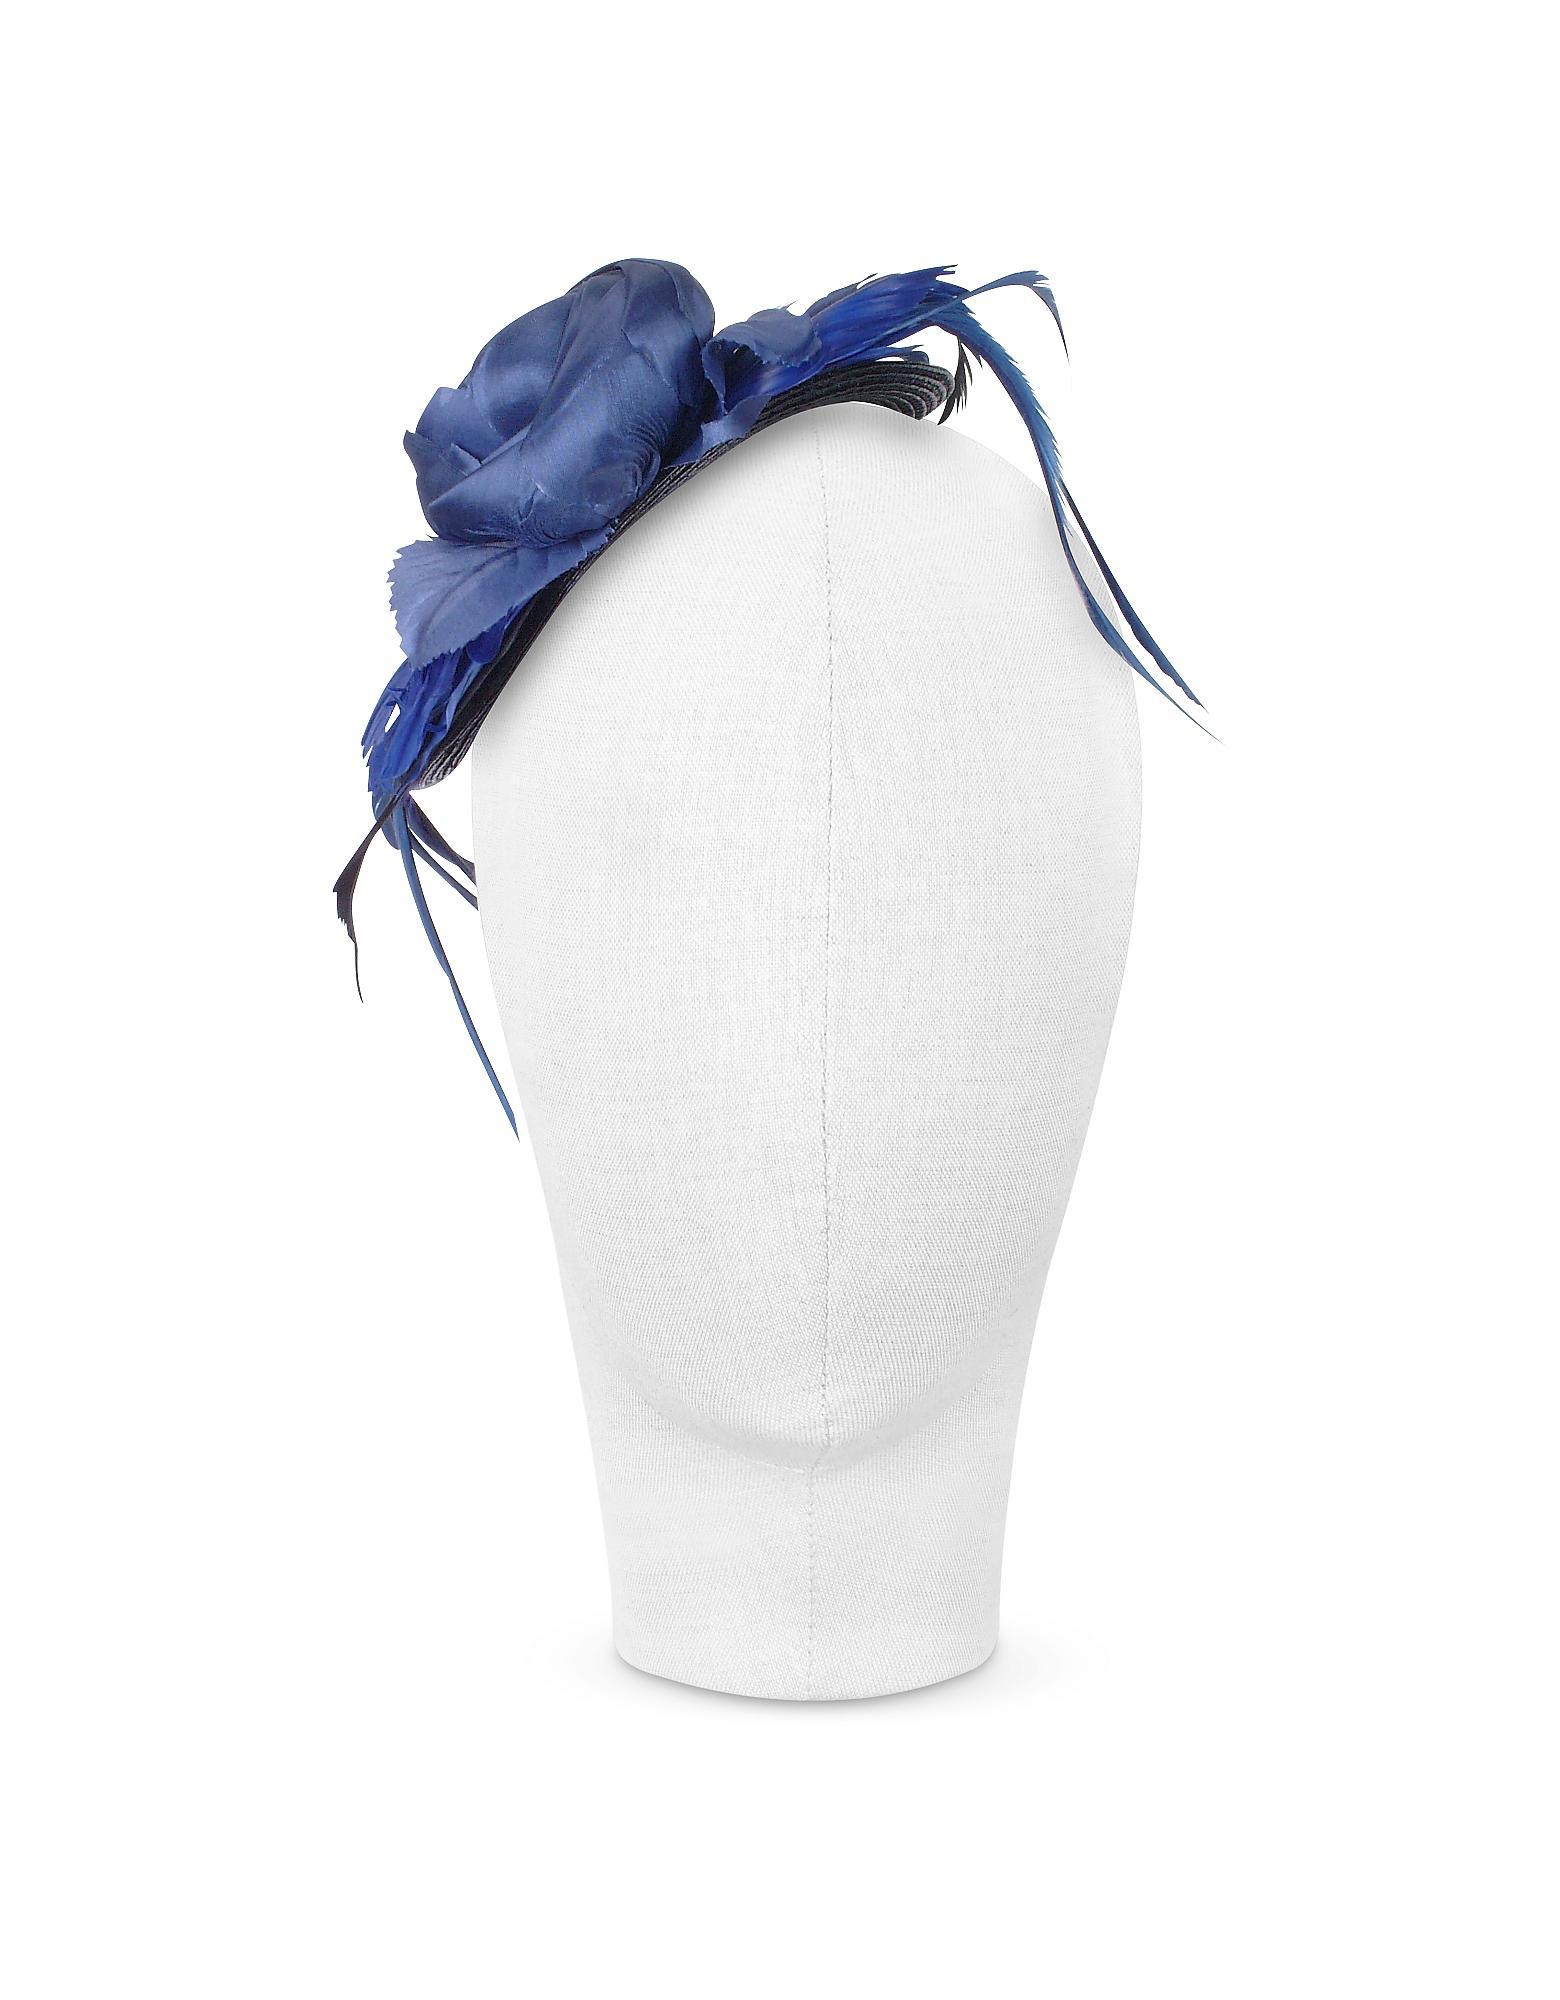 31551015e96 Nana  Alba - Night Blue Flower Feather Hat Disc in Blue - Lyst